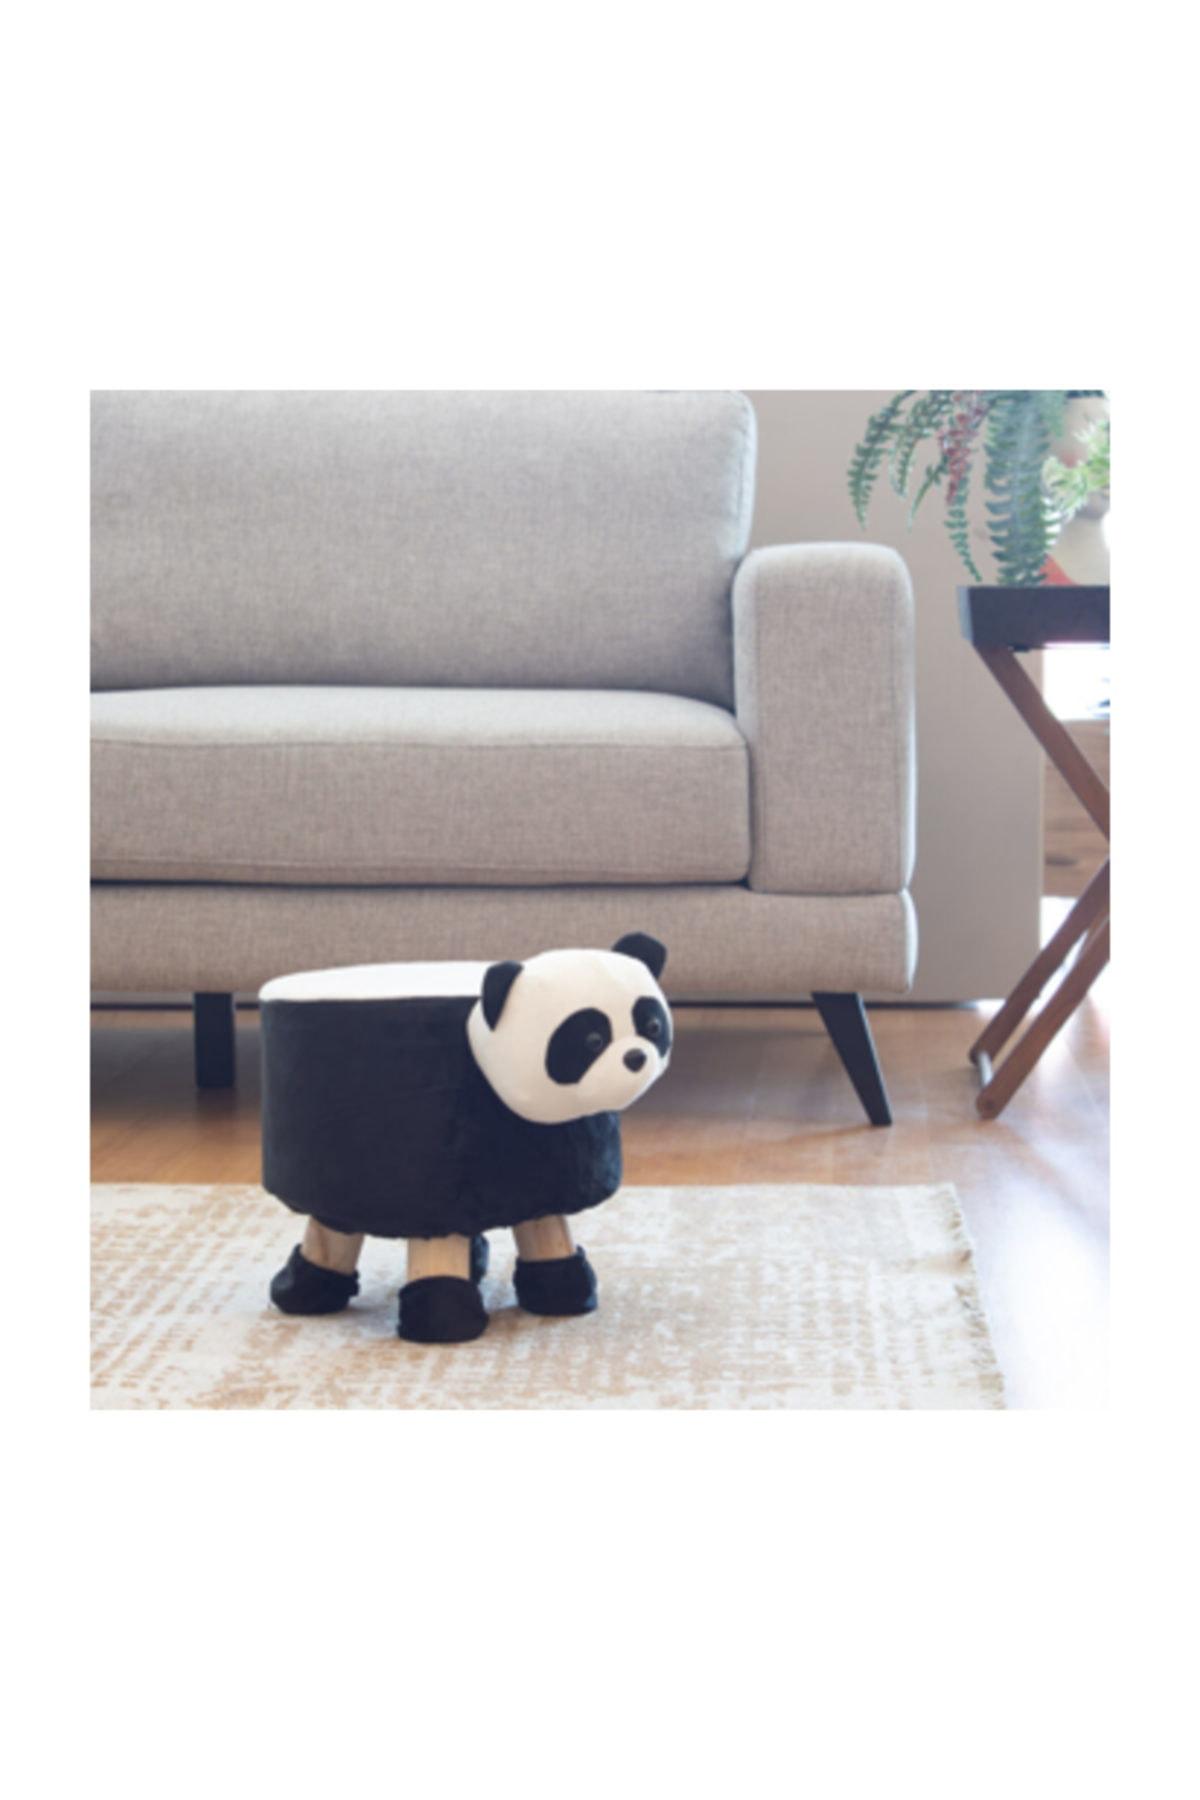 Tmall Home Design Panda Seklinde Puf 28x28 Cm Trendyol